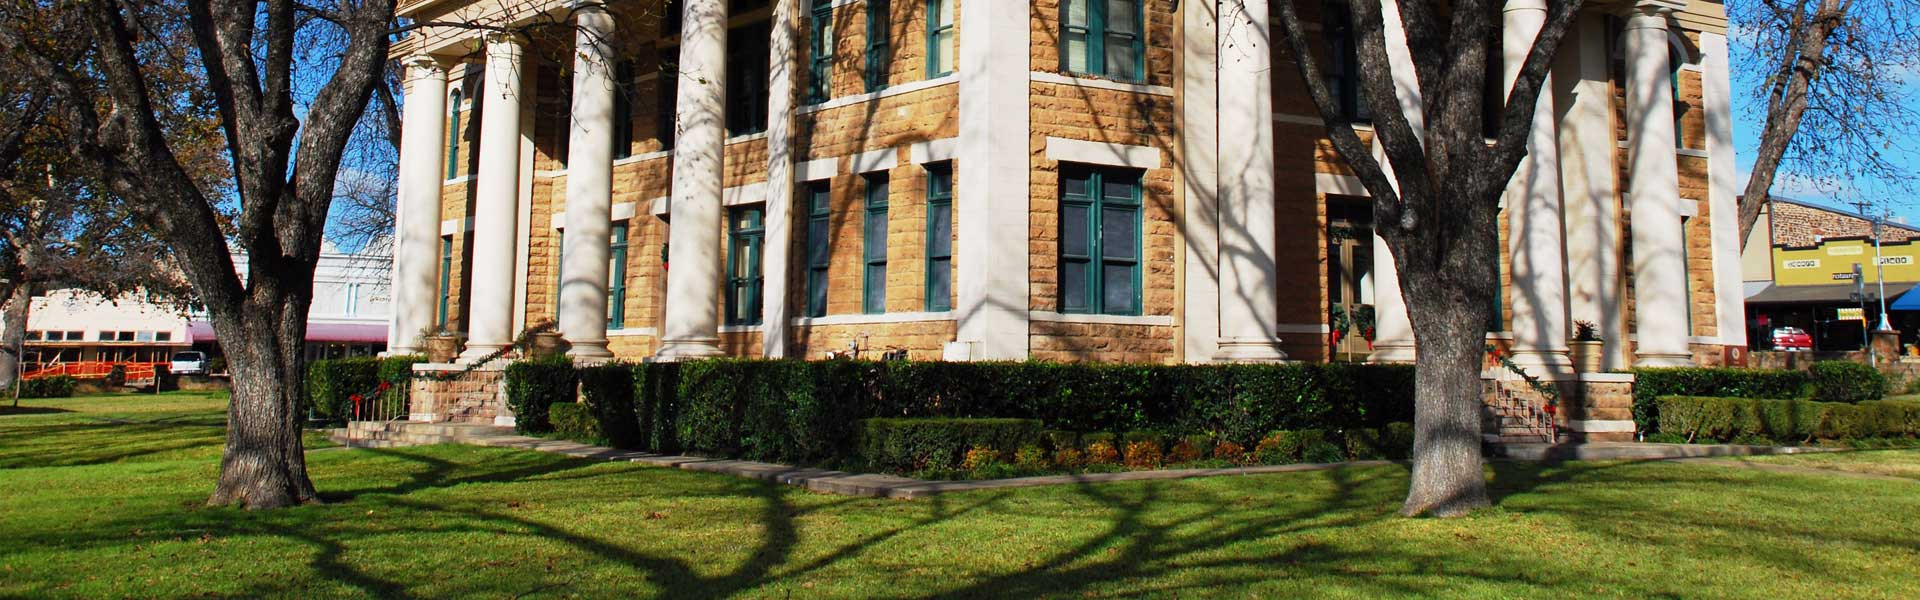 Car Insurance Quotes in Mason County Texas